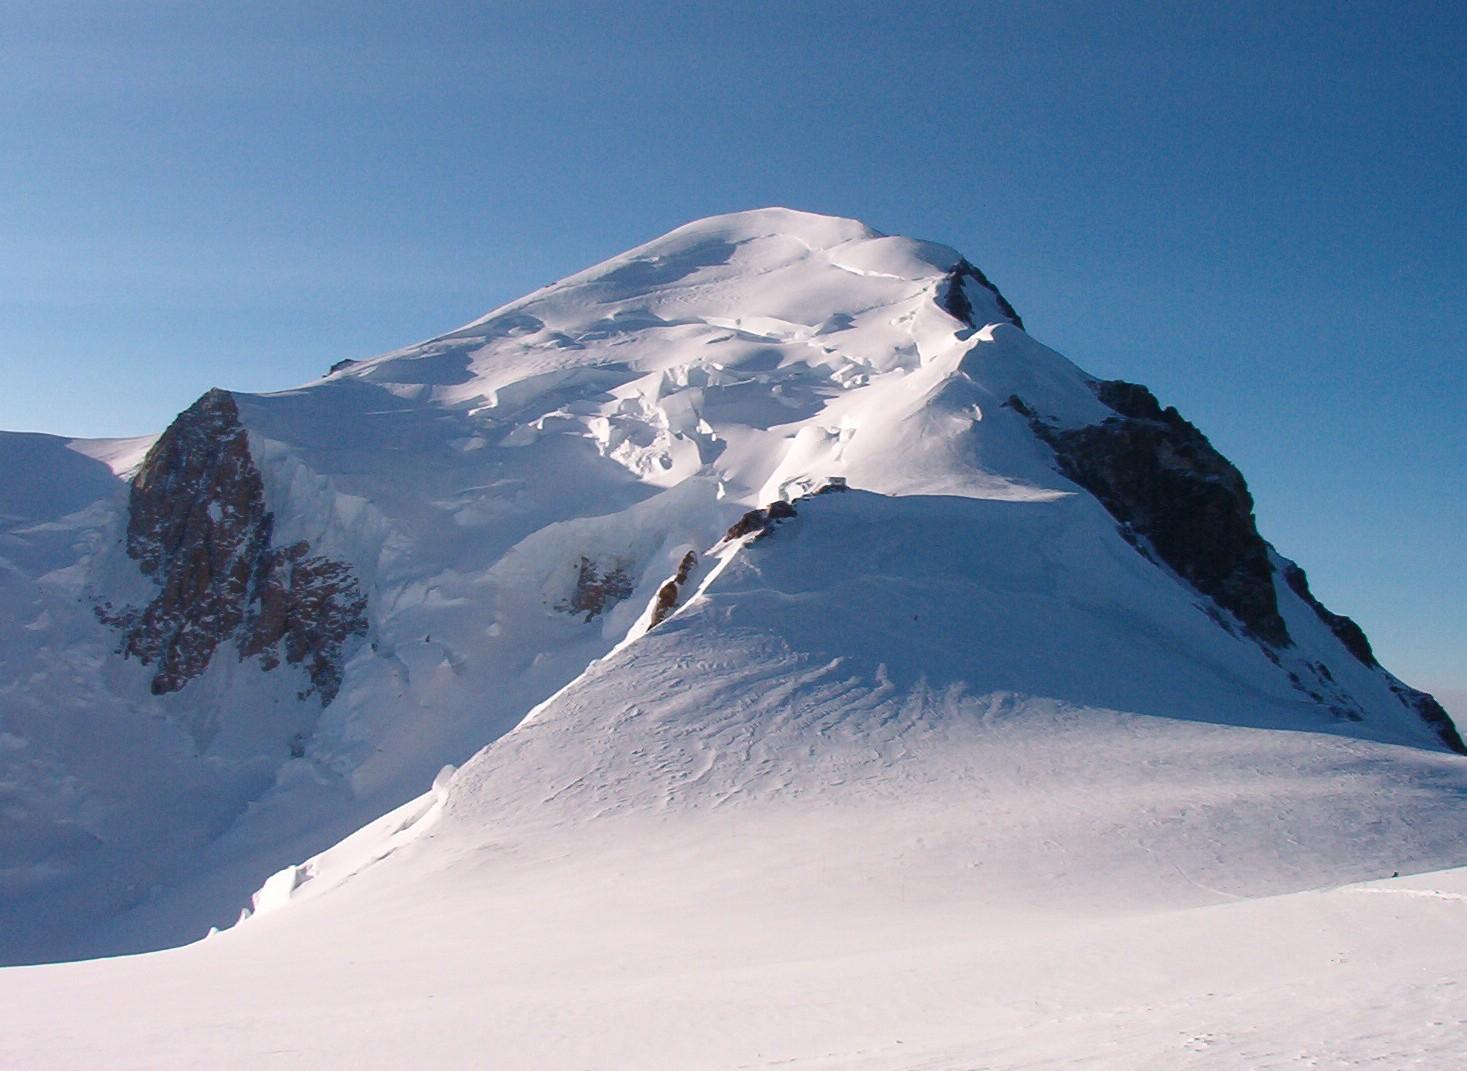 Monte_Bianco_dal_Dome_du_Gouter